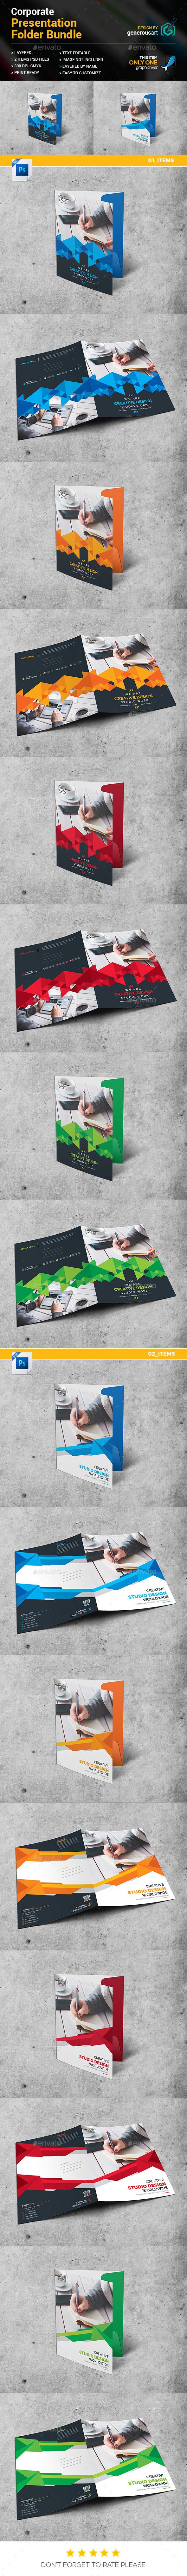 Presentation Folder Bundle 2 in 1 - Stationery Print Templates